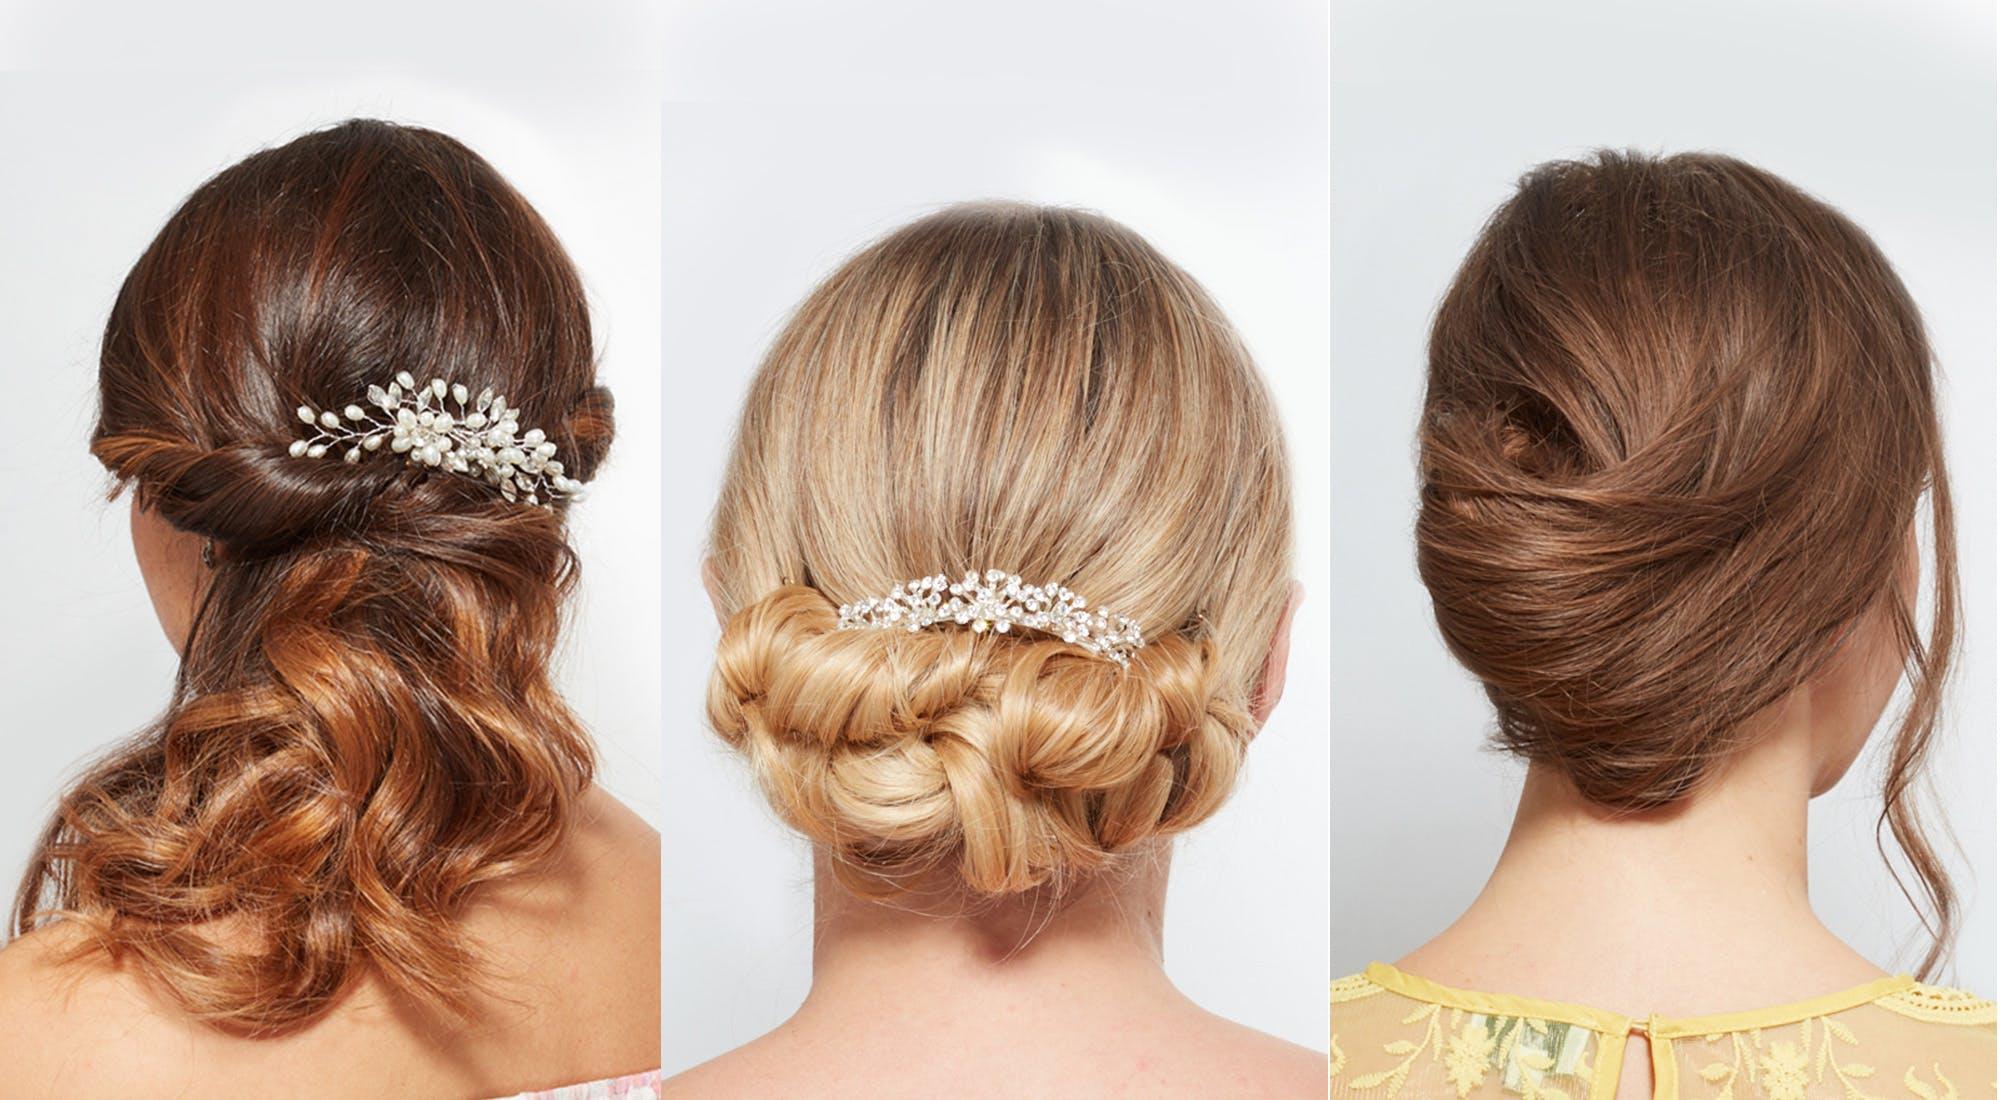 4 Bridesmaid hairstyle ideas | blow LTD